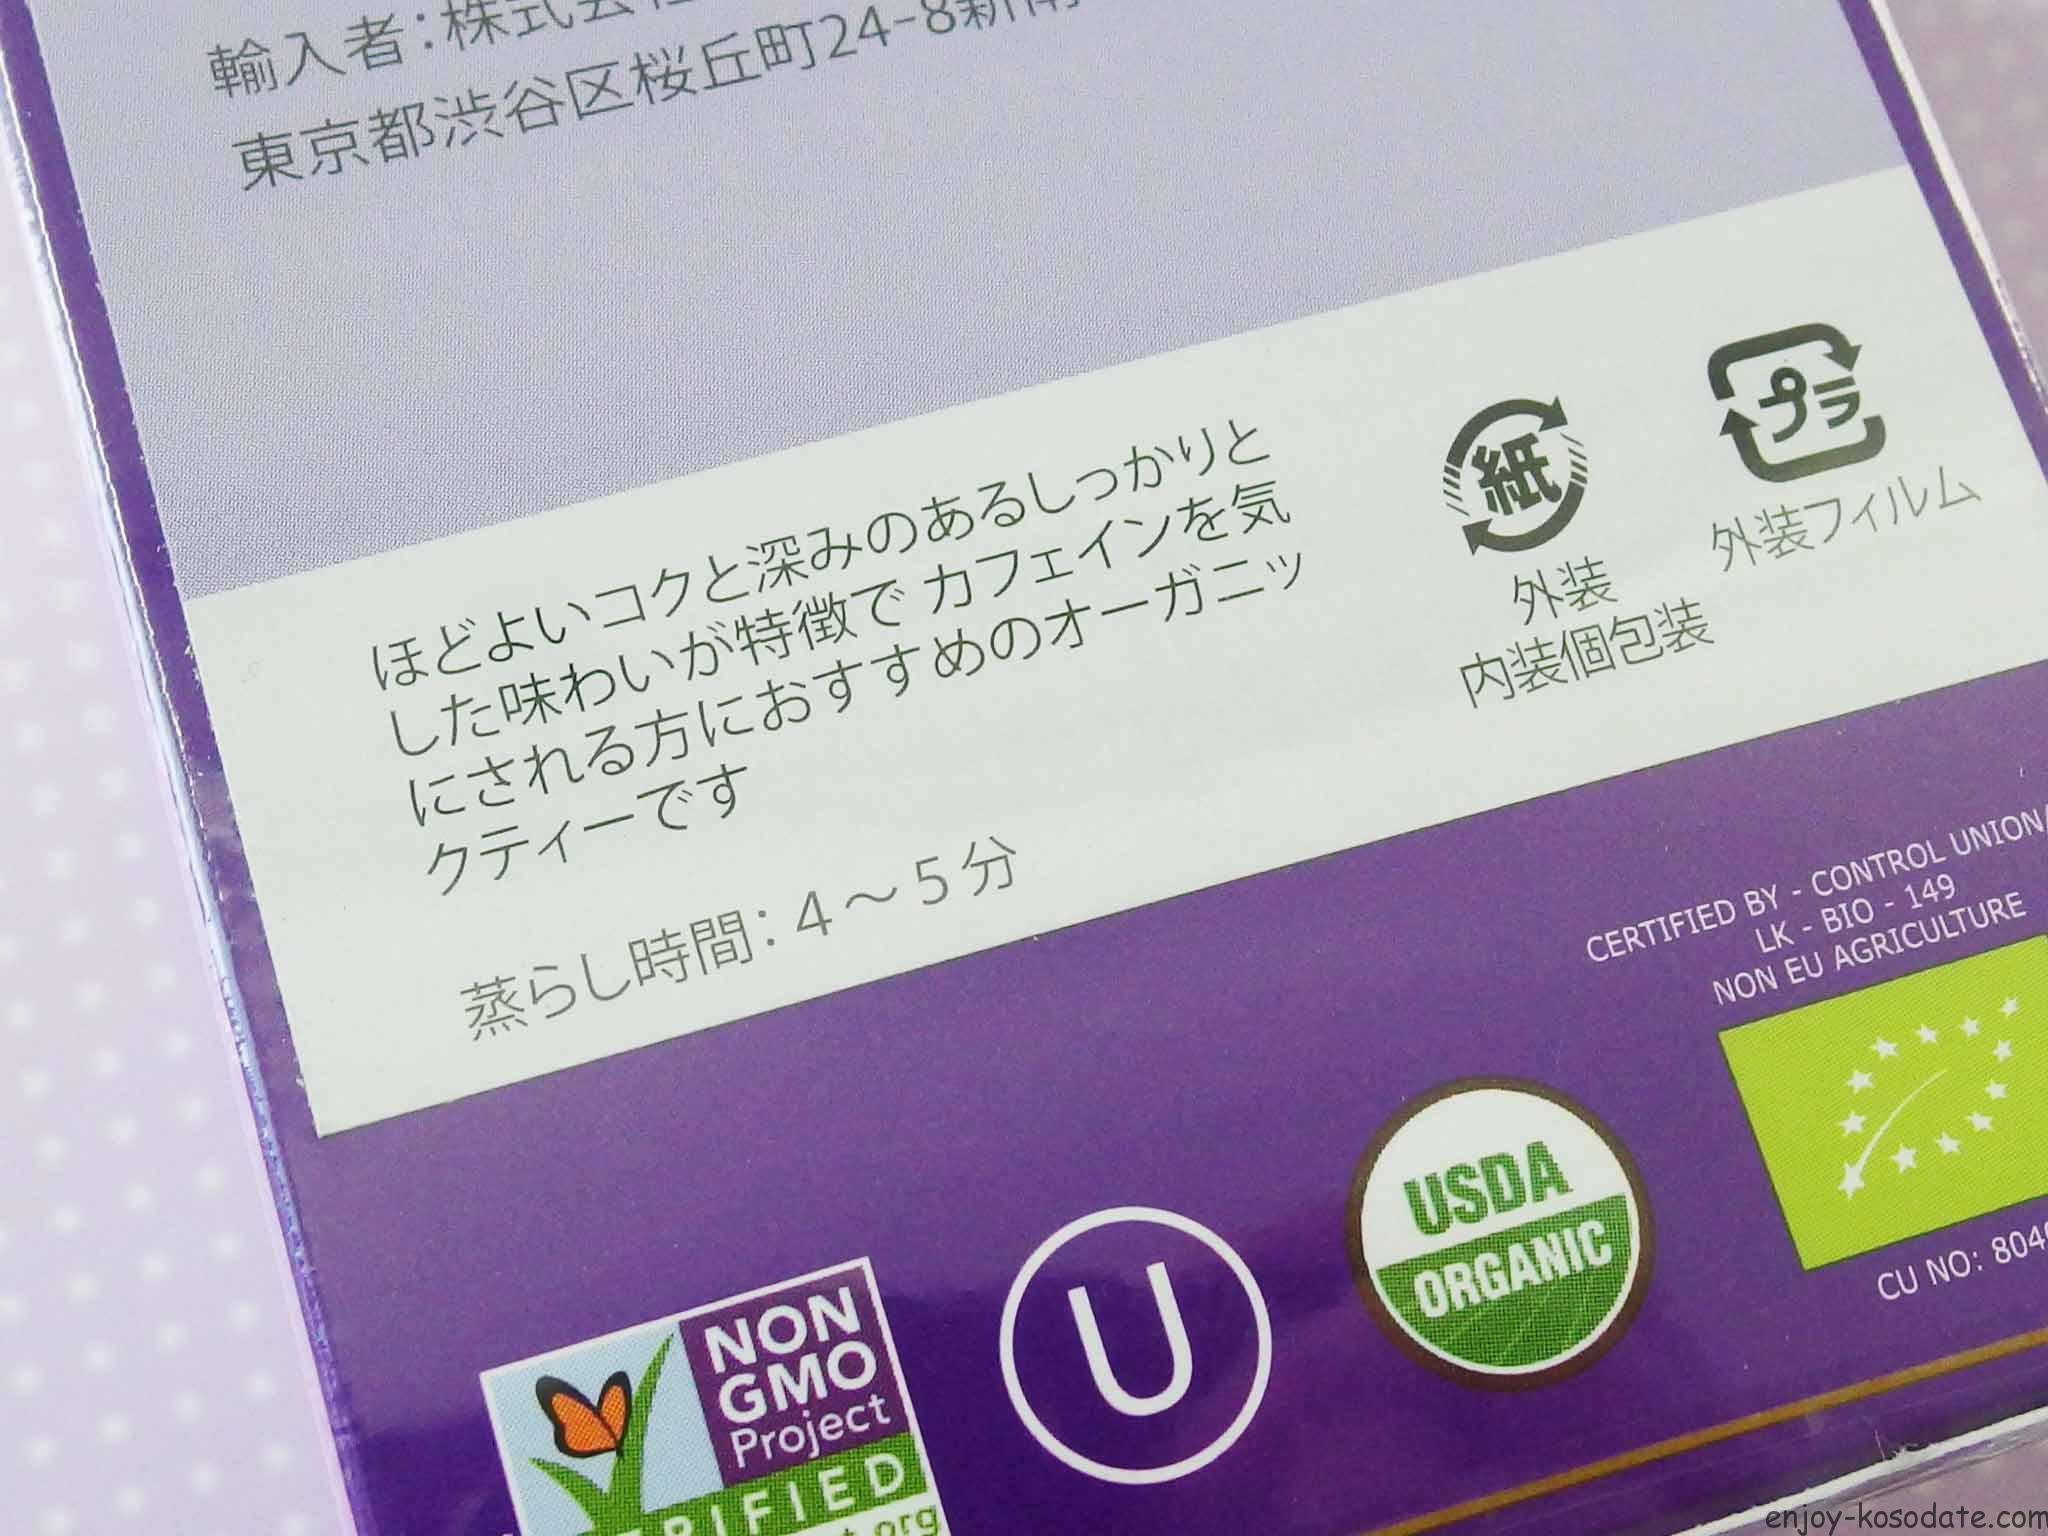 IMGP4108 - コピー